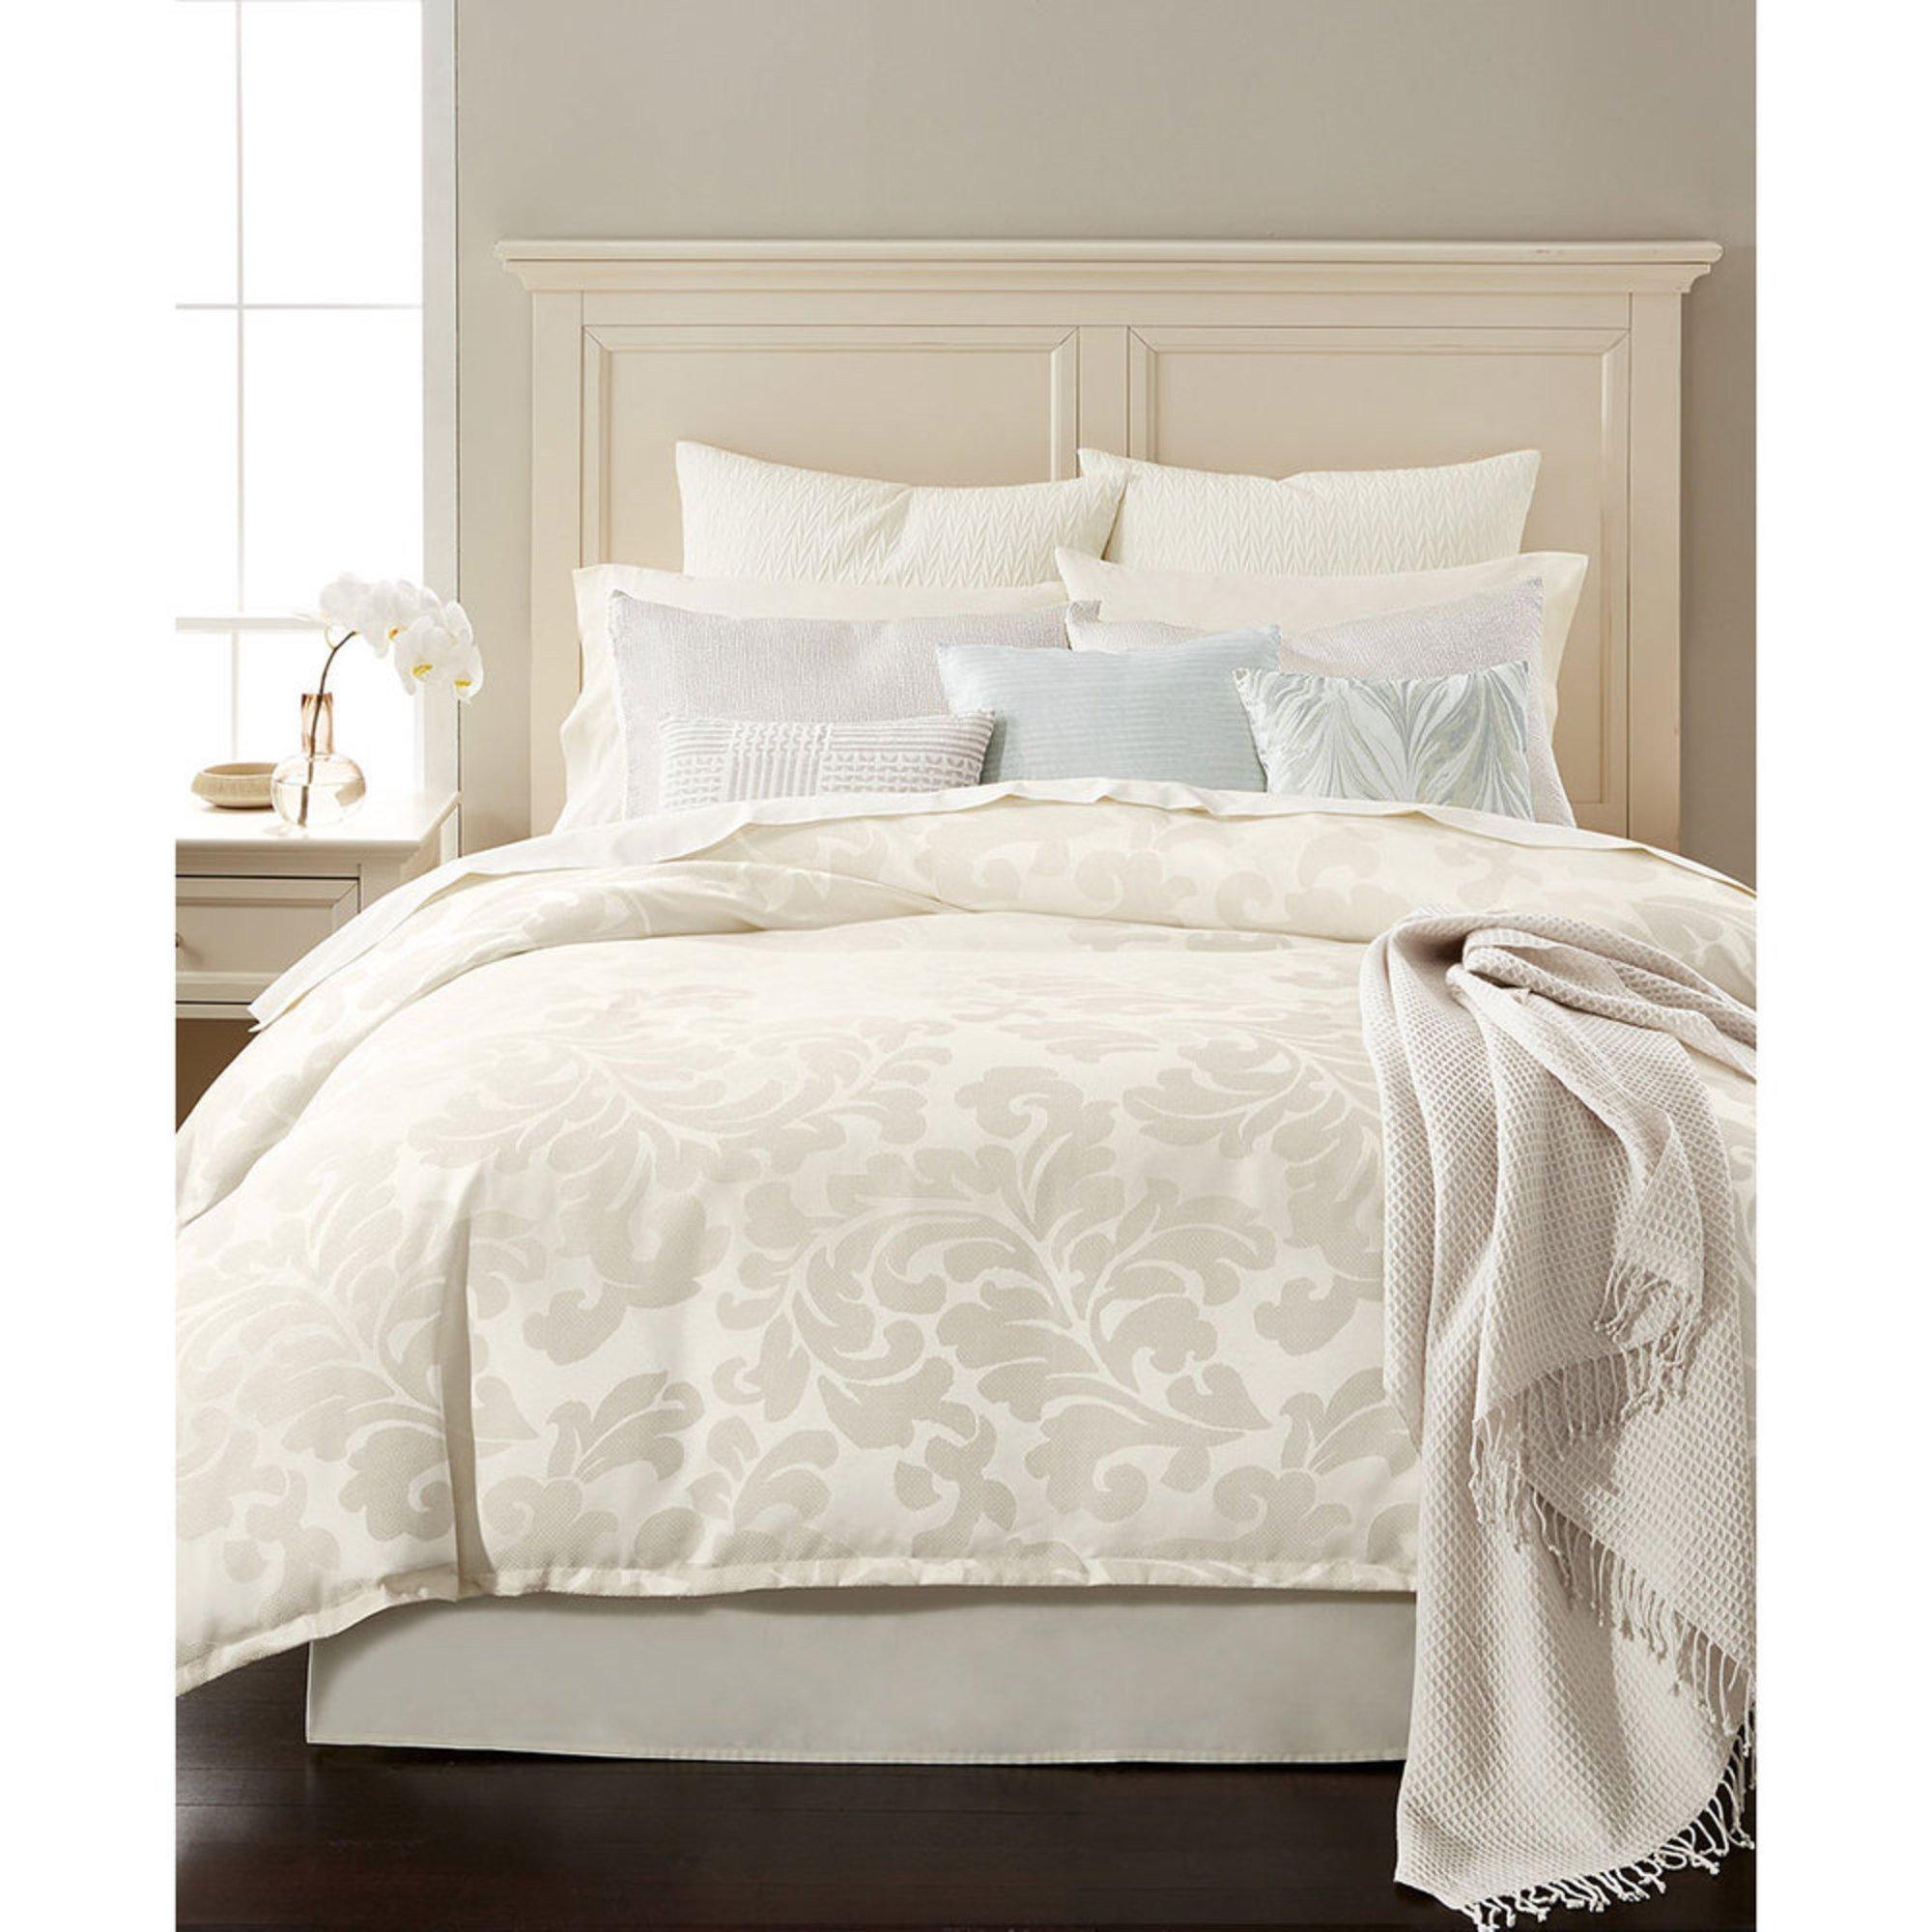 Martha Stewart Collection Feather Breeze 14 piece Comforter Set